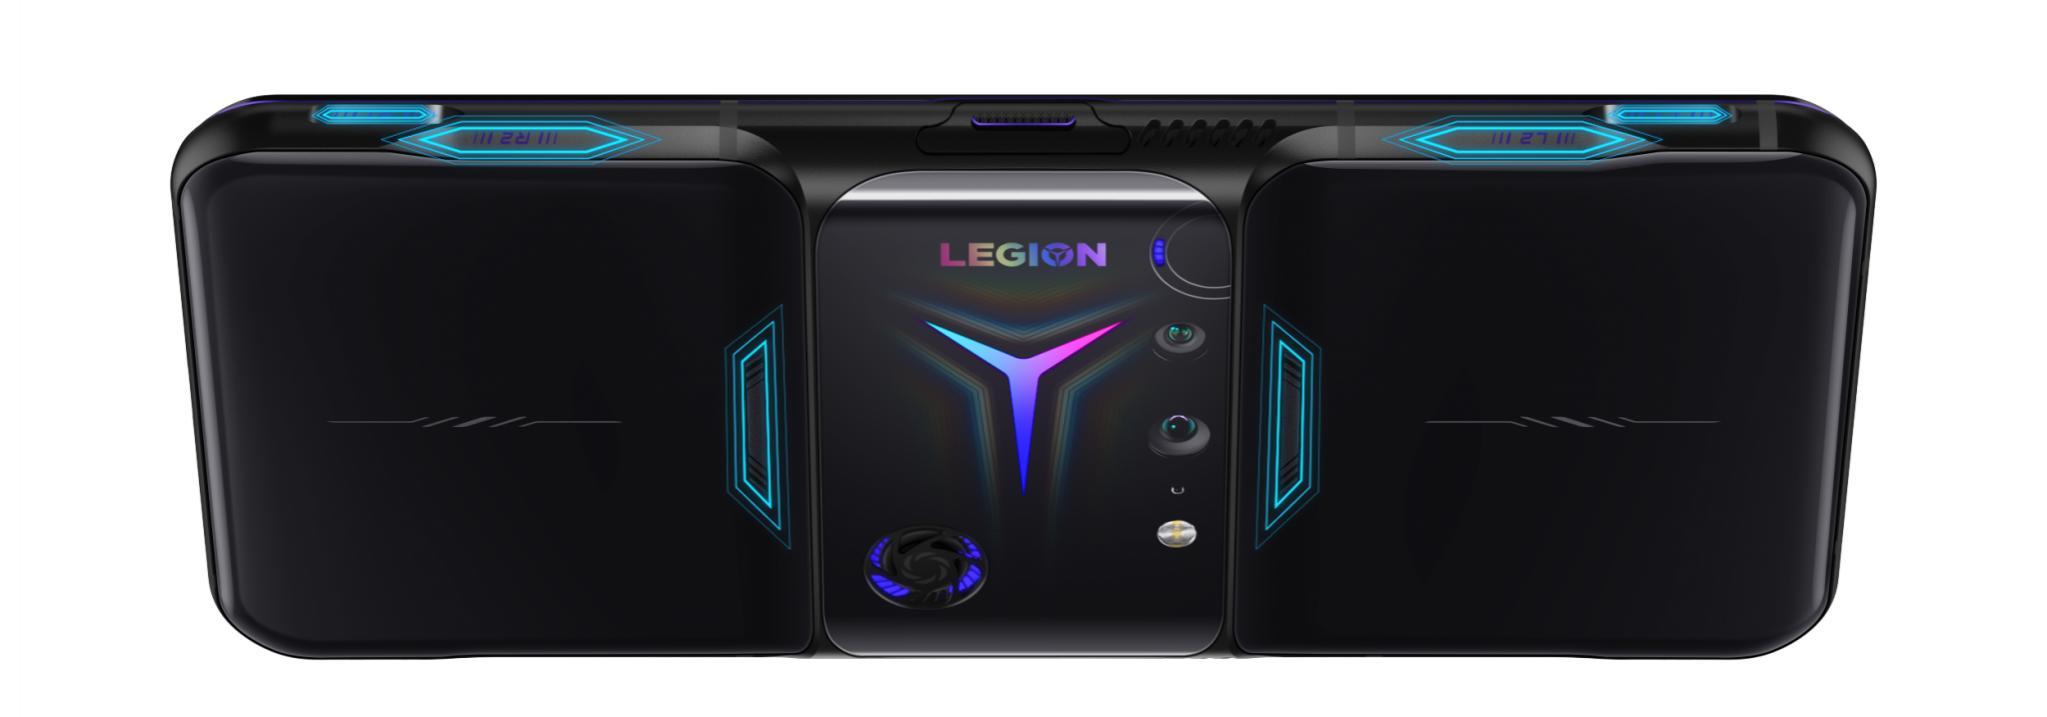 Name:  Lenovo-Legion-Phone-Duel-2_Ultimate-Black_Octa-Triggericon-1-e1617741259212-2048x717.jpg Views: 108 Size:  72.1 KB